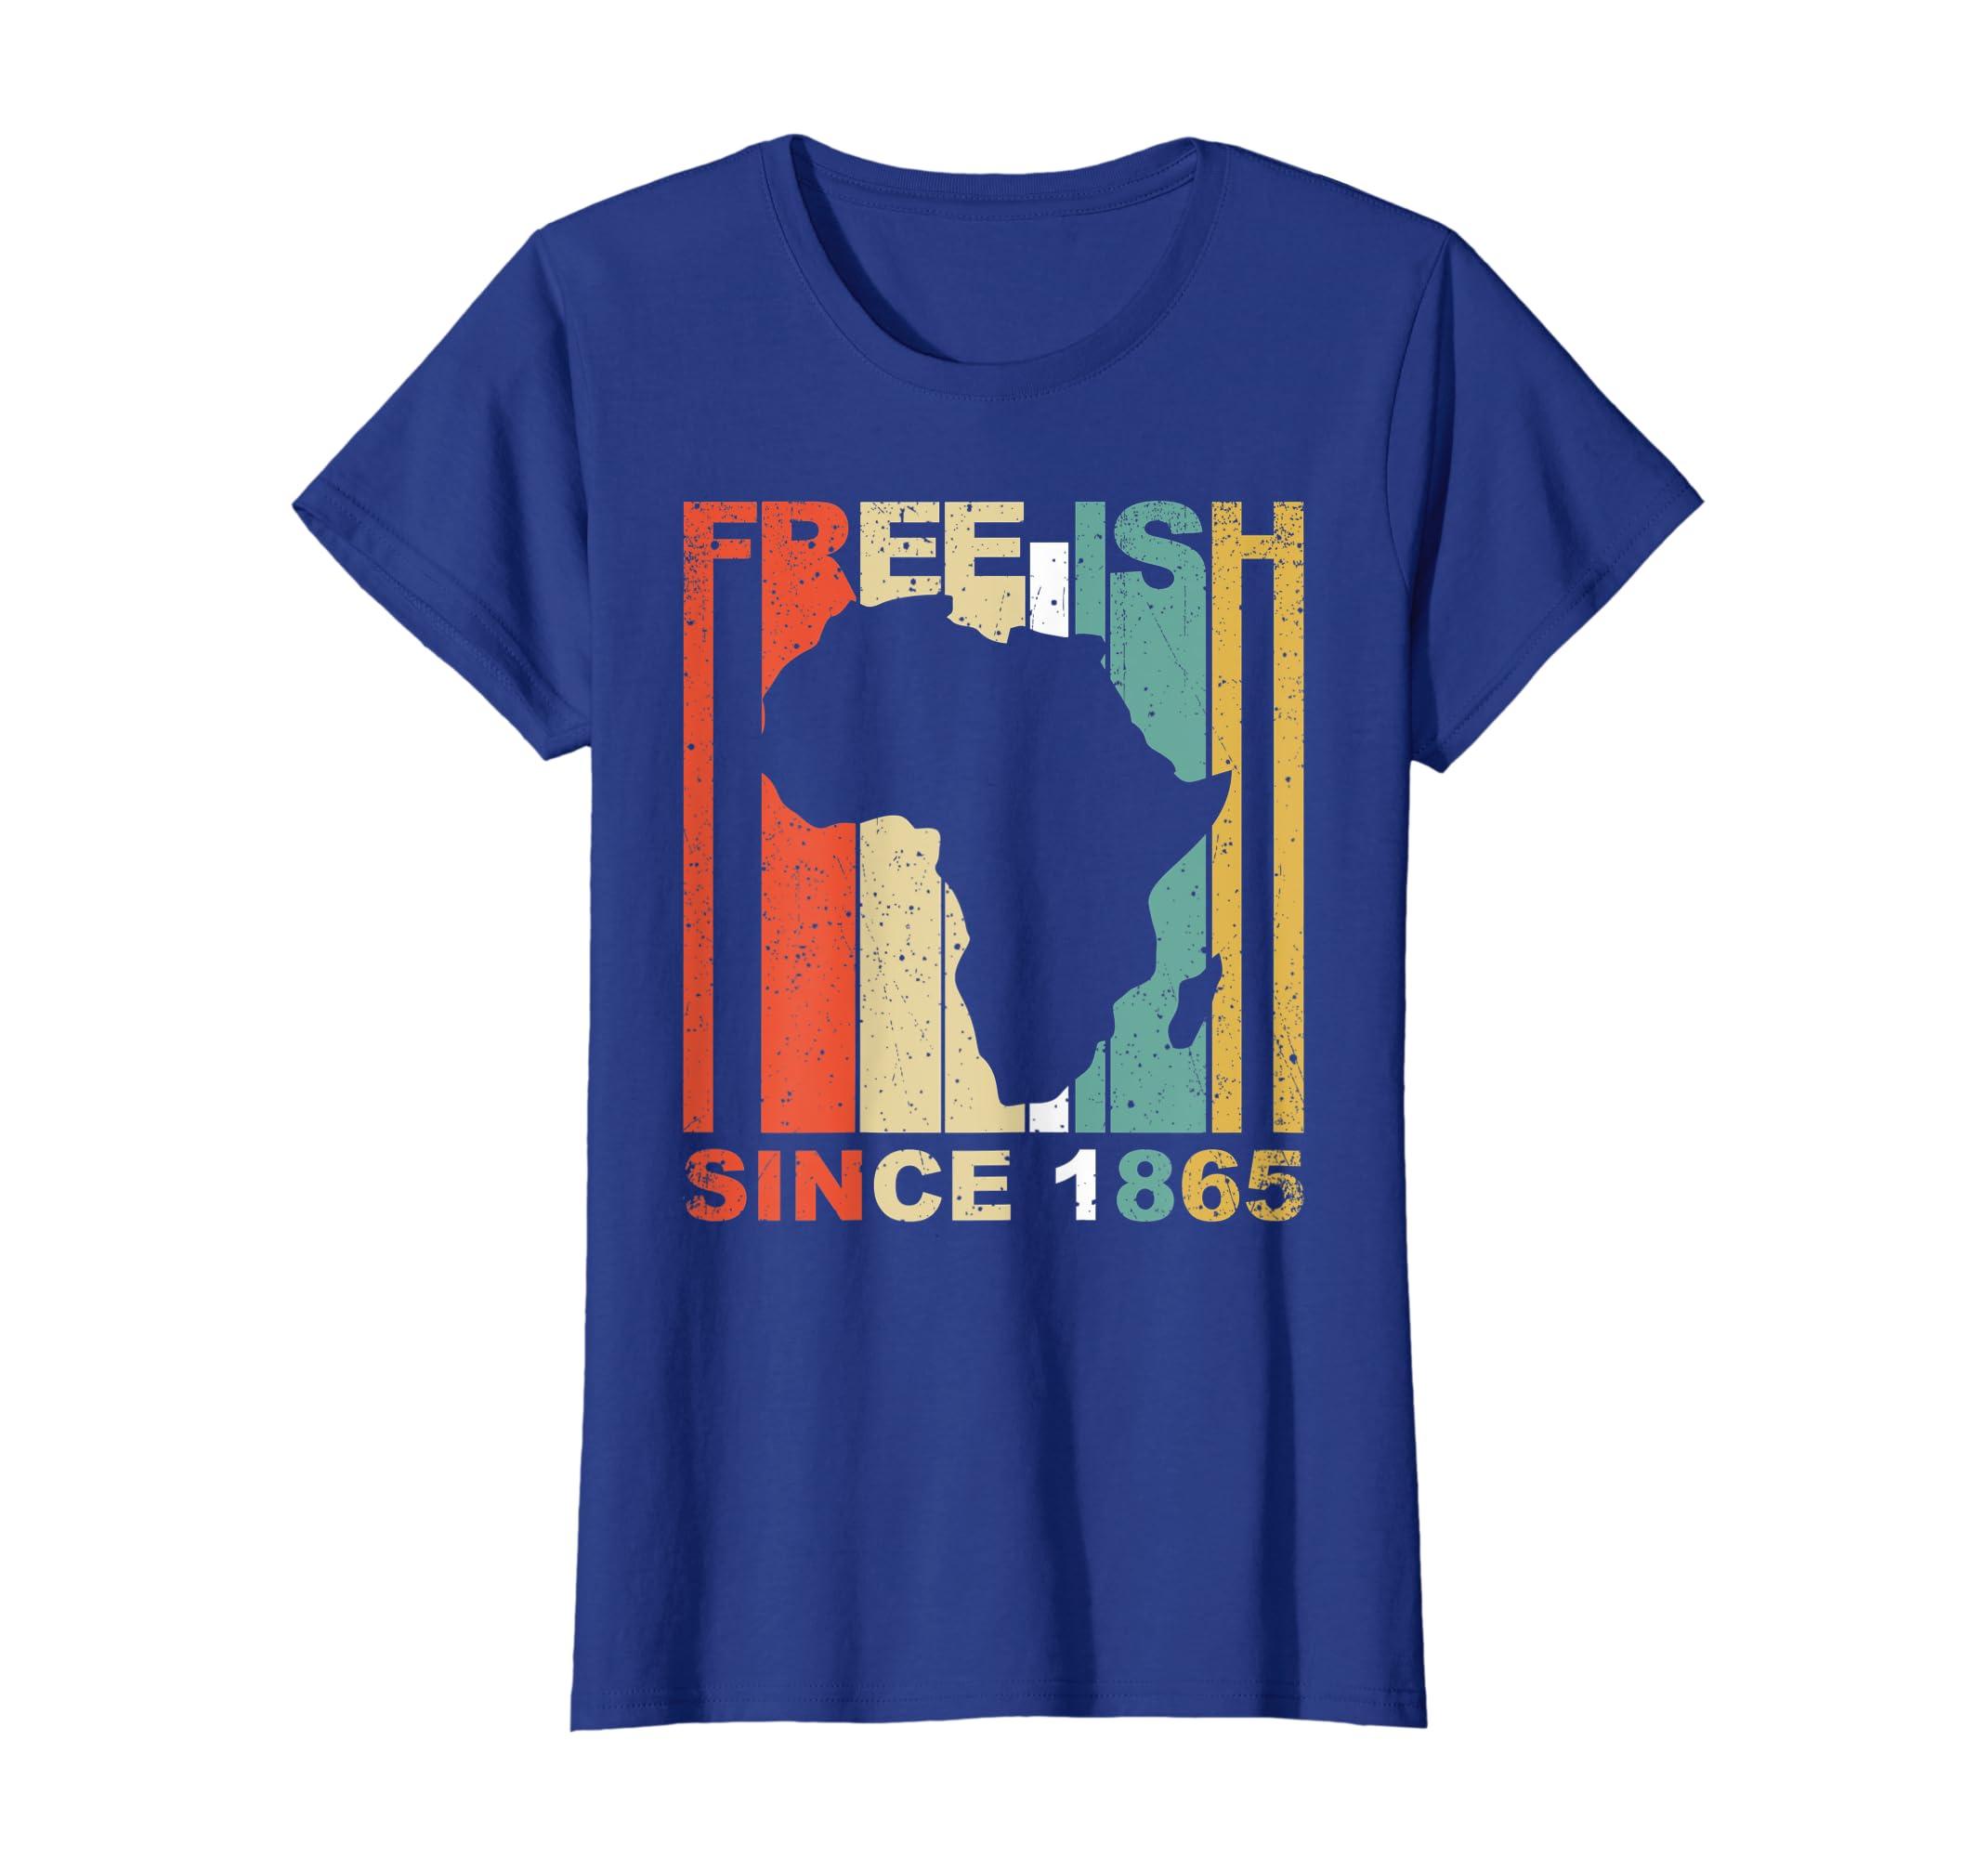 766a9230ad7 Amazon.com: African American Black History Free-ish 1865 T Shirt MM:  Clothing